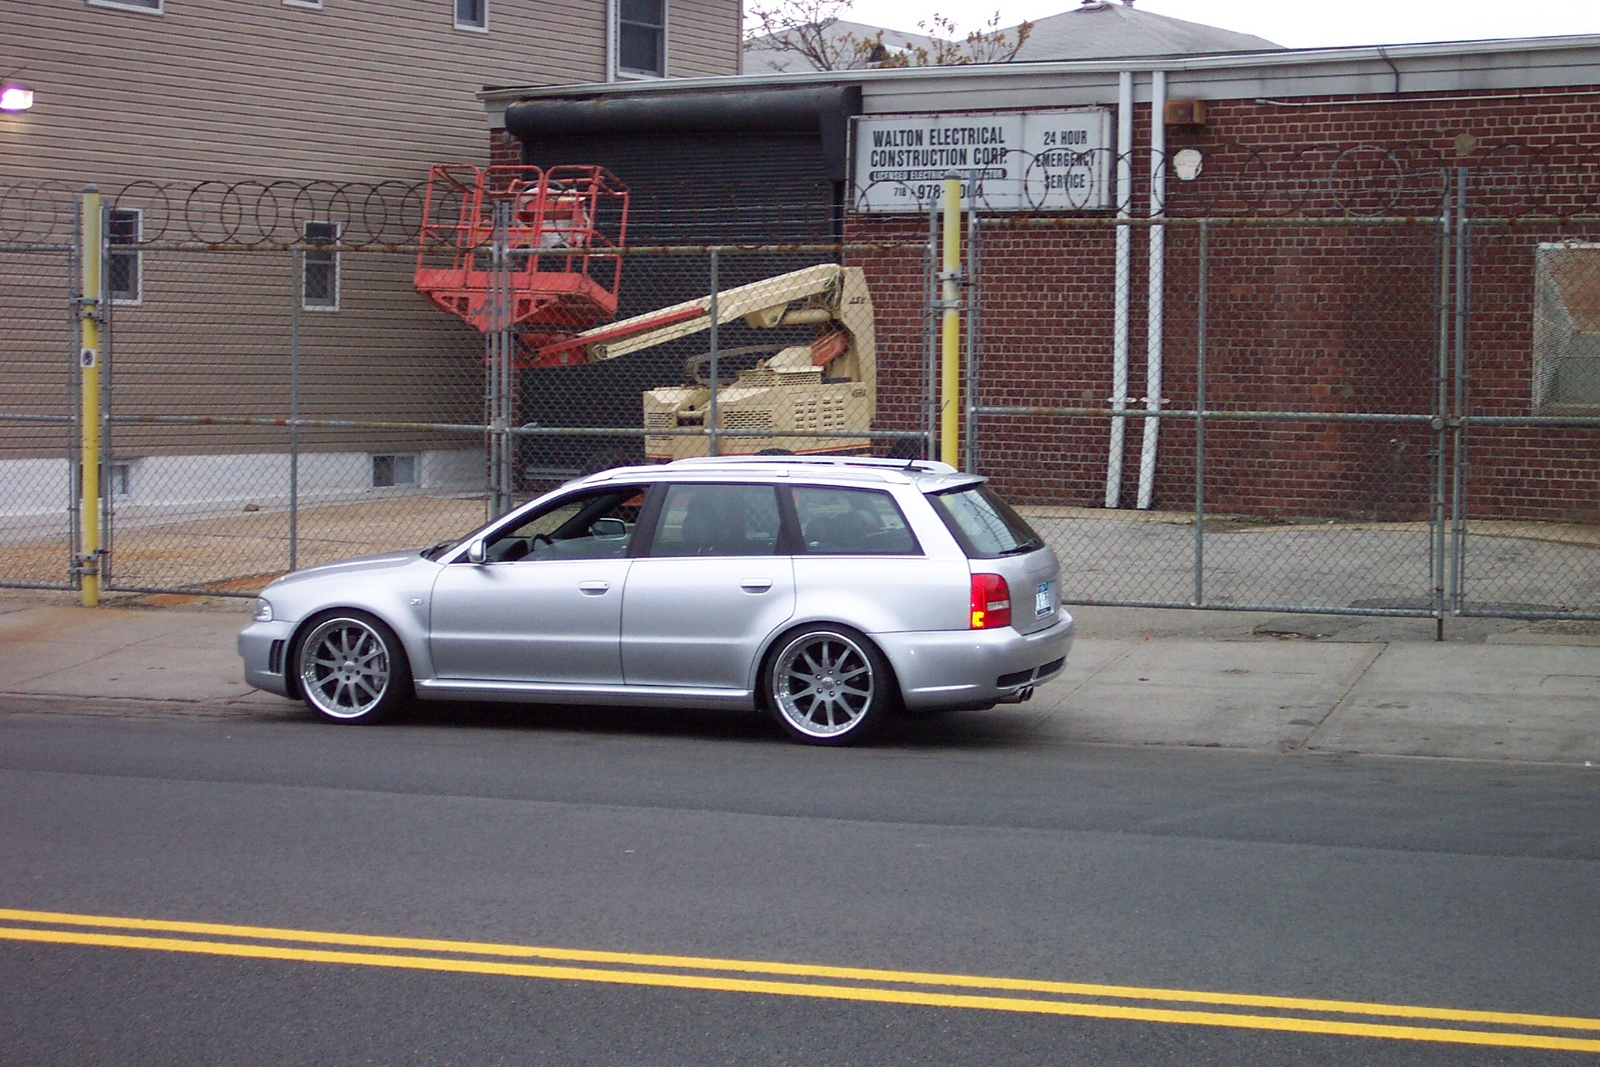 2001 Audi RS 4, 2002 Audi S4 4 Dr Avant quattro Turbo AWD Wagon ...